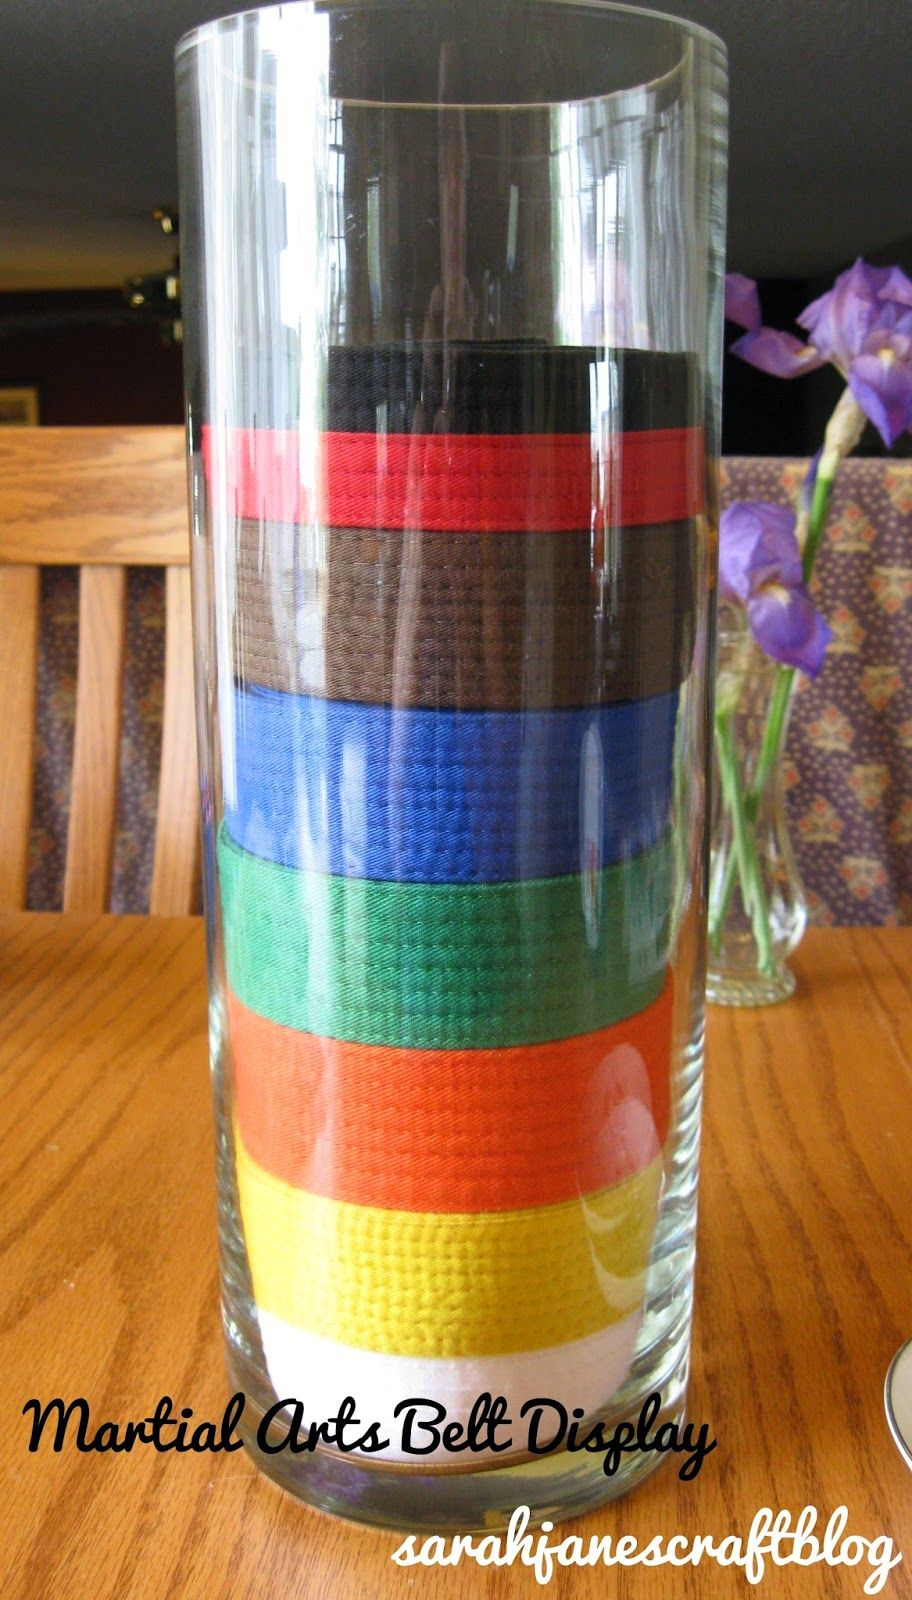 Sarah Jane's Craft Blog: Martial Arts Belt Display Vase